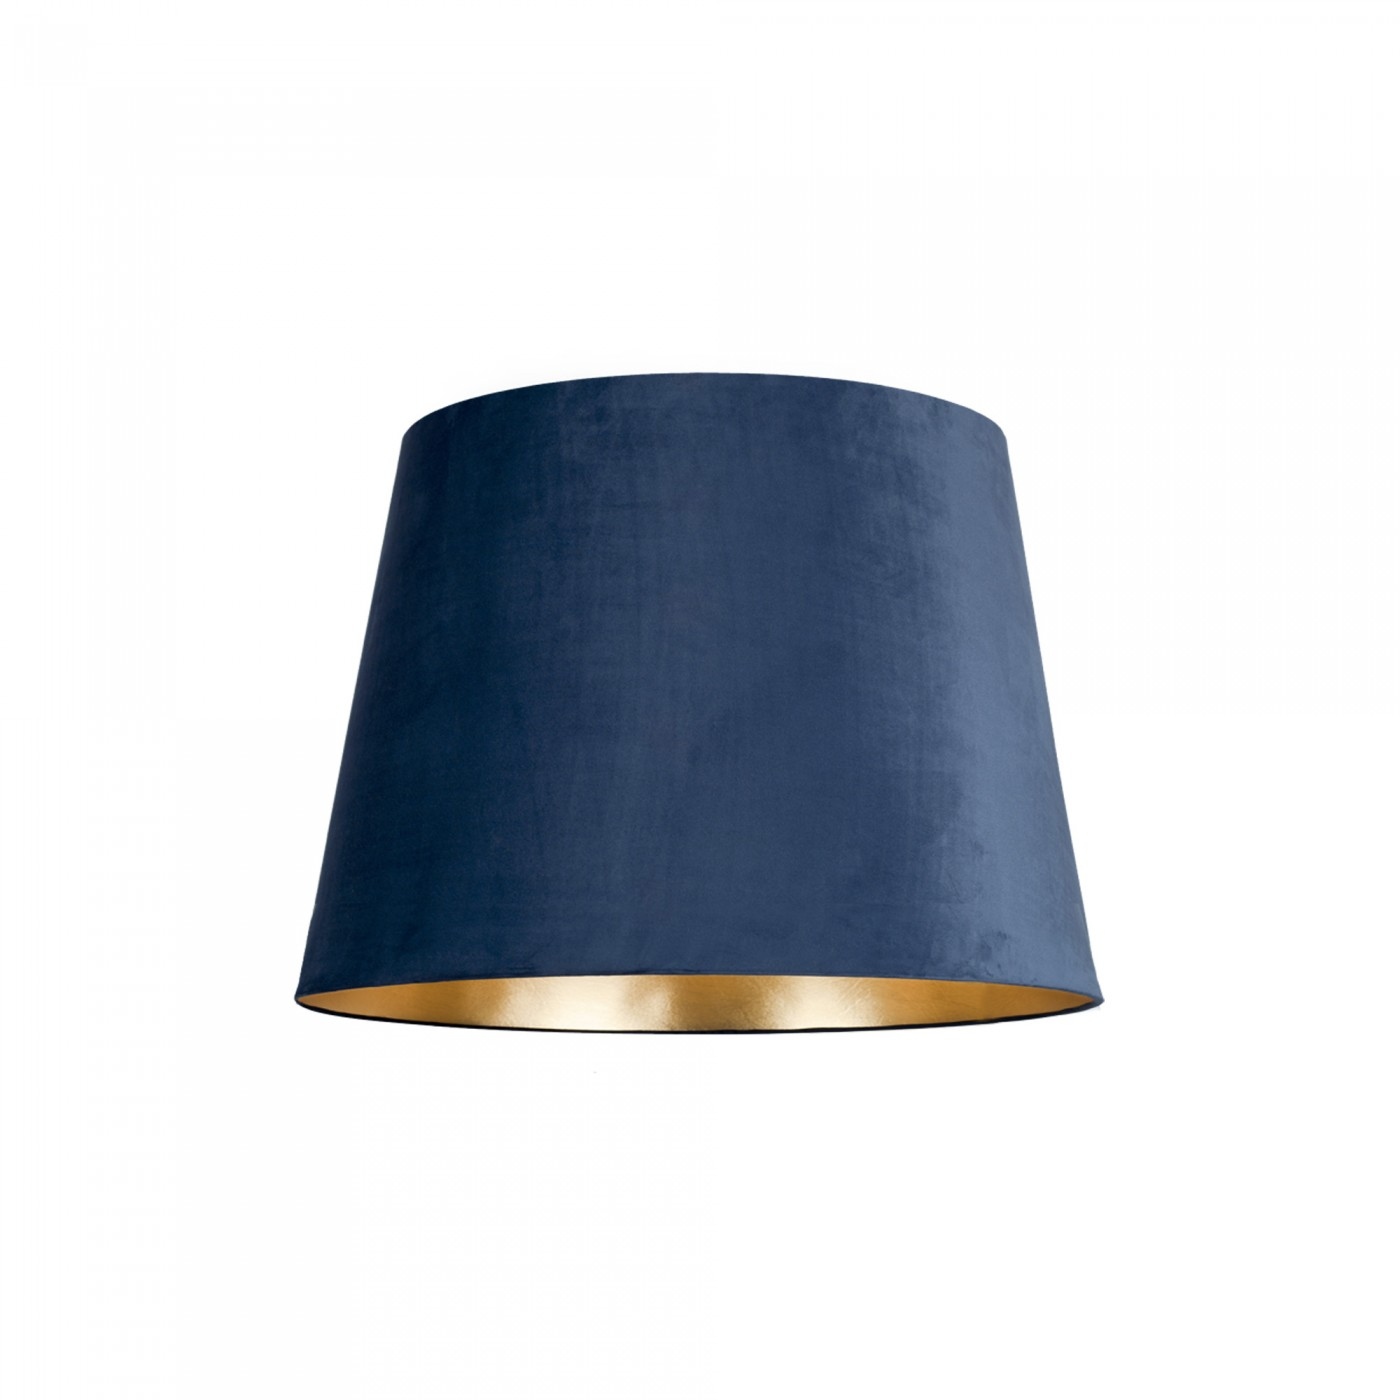 CAMELEON CONE M V NB/G 8497 Nowodvorski Lighting